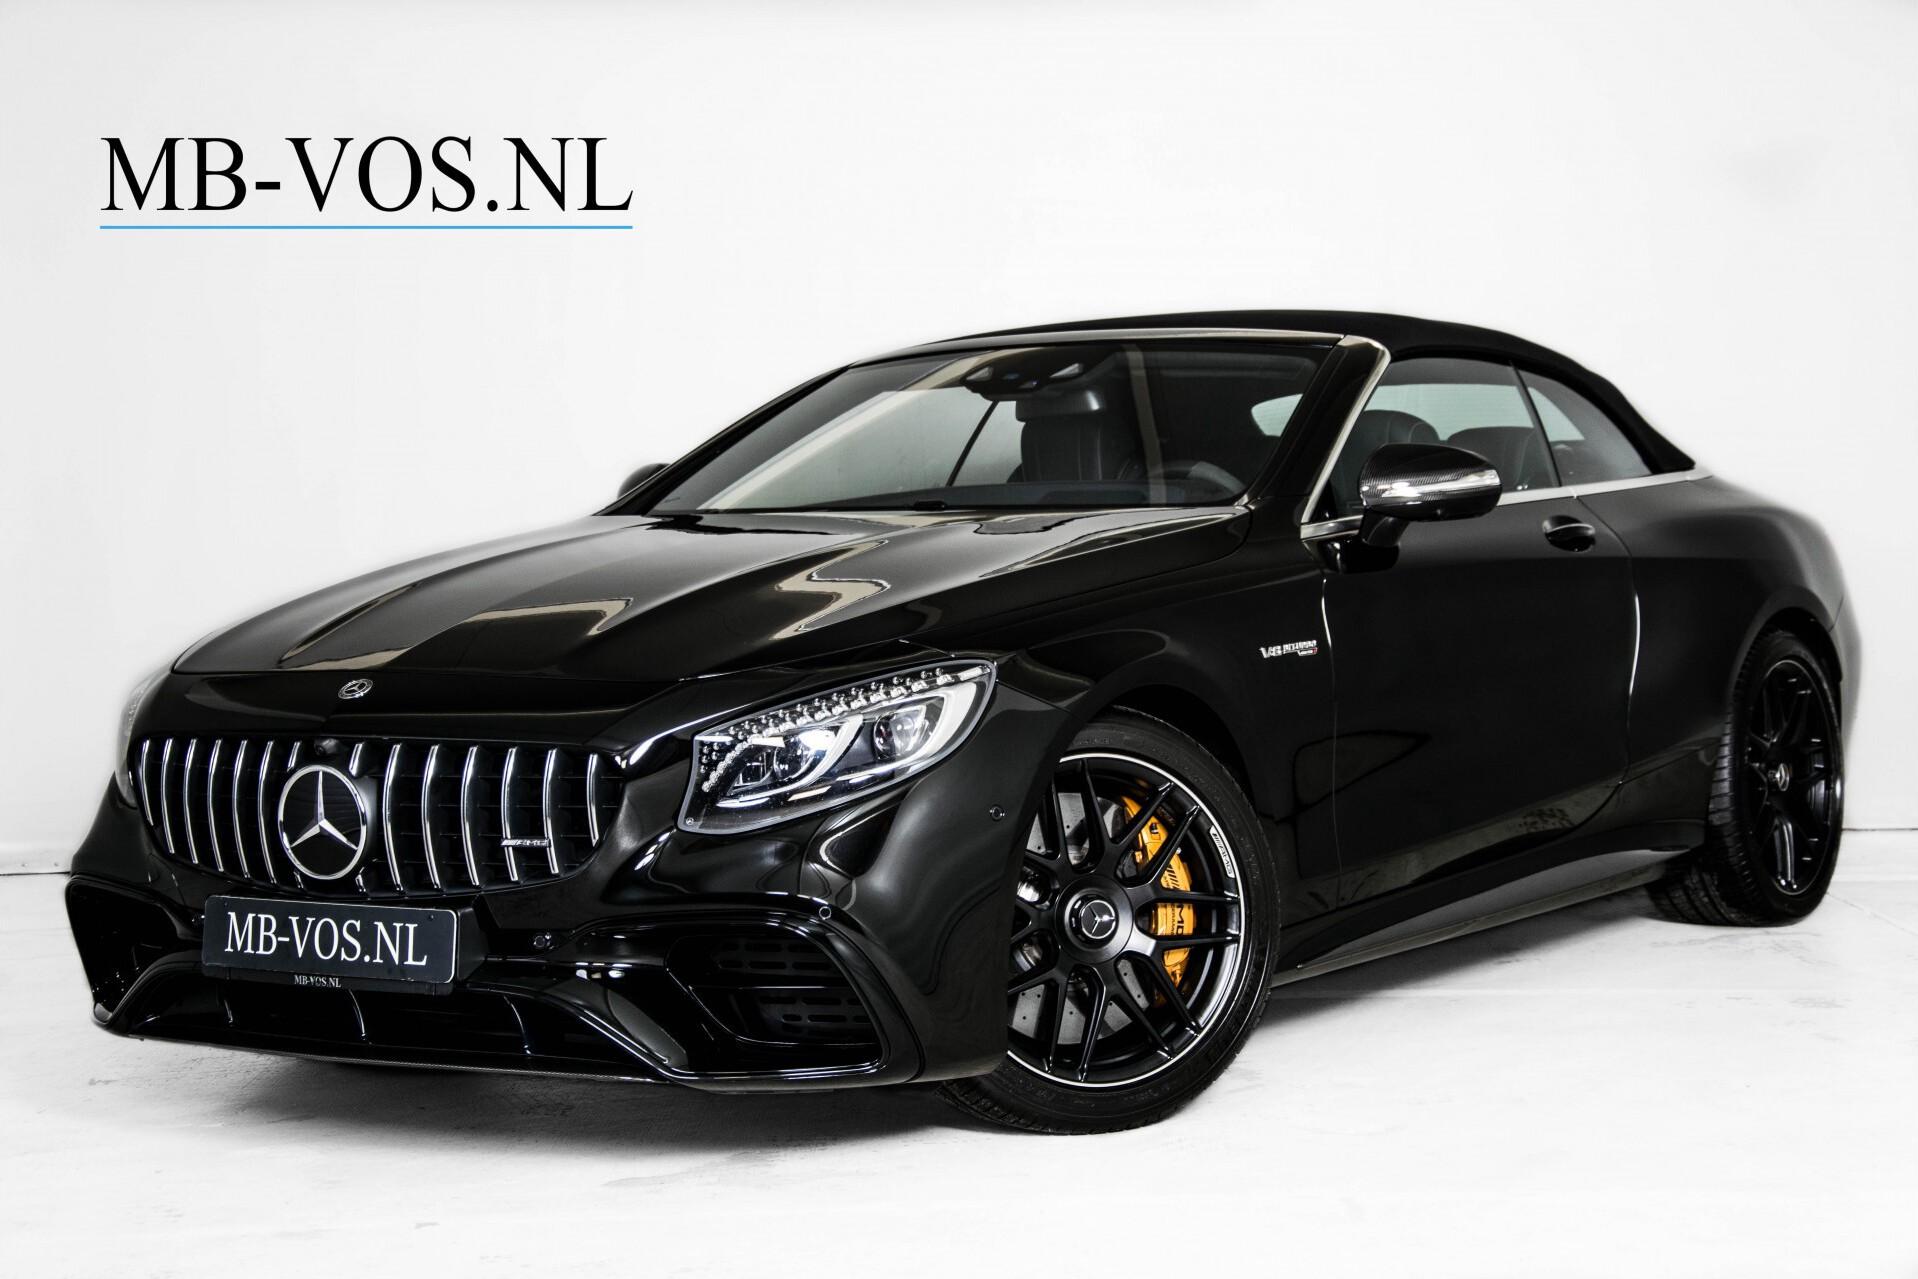 Mercedes-Benz S-Klasse Cabrio 63 AMG 4-M Ceramic/Designo/Carbon/Burmester High End Aut Foto 3